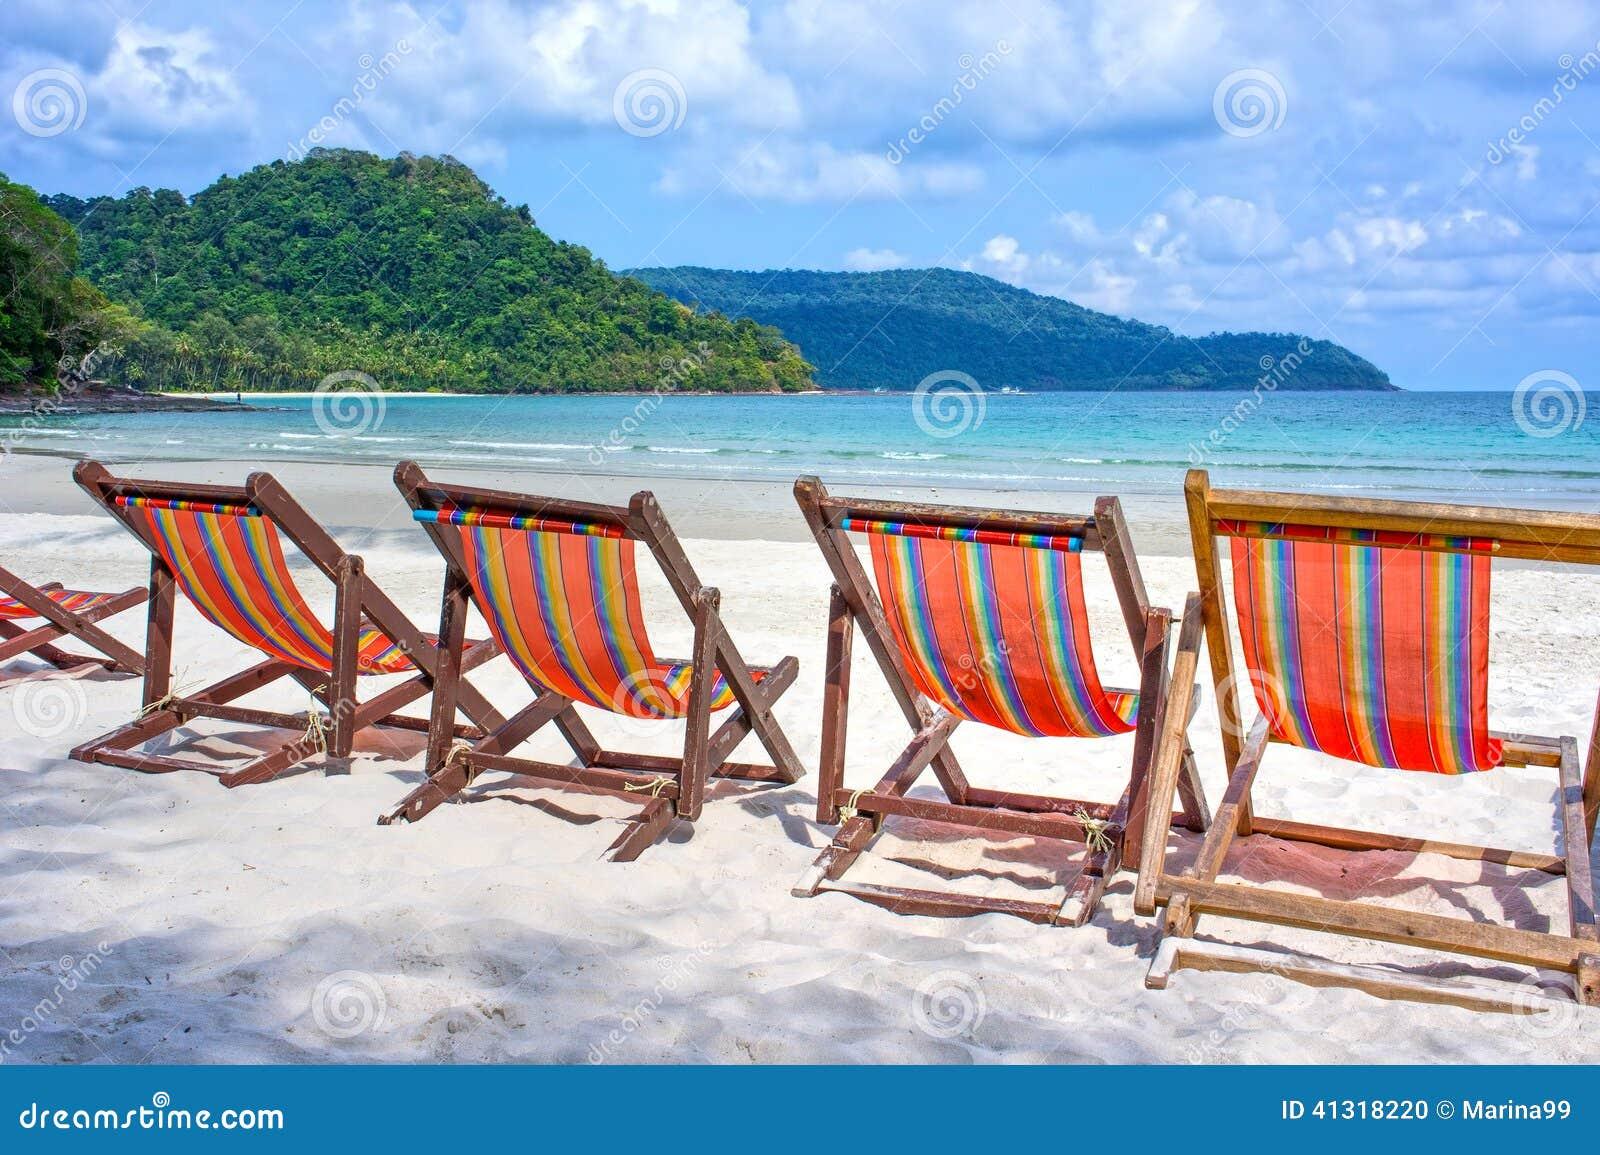 Beach Chairs The White Sand Beach Stock Image